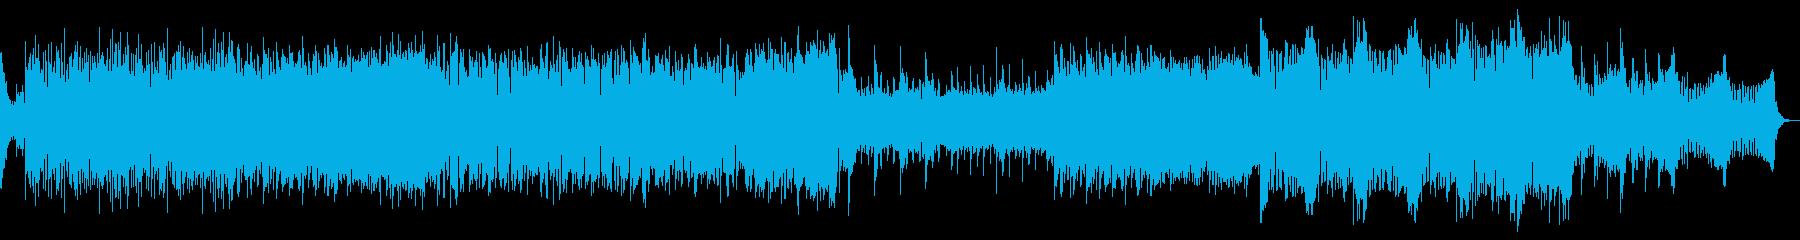 GrowlBassが激しいDubStepの再生済みの波形